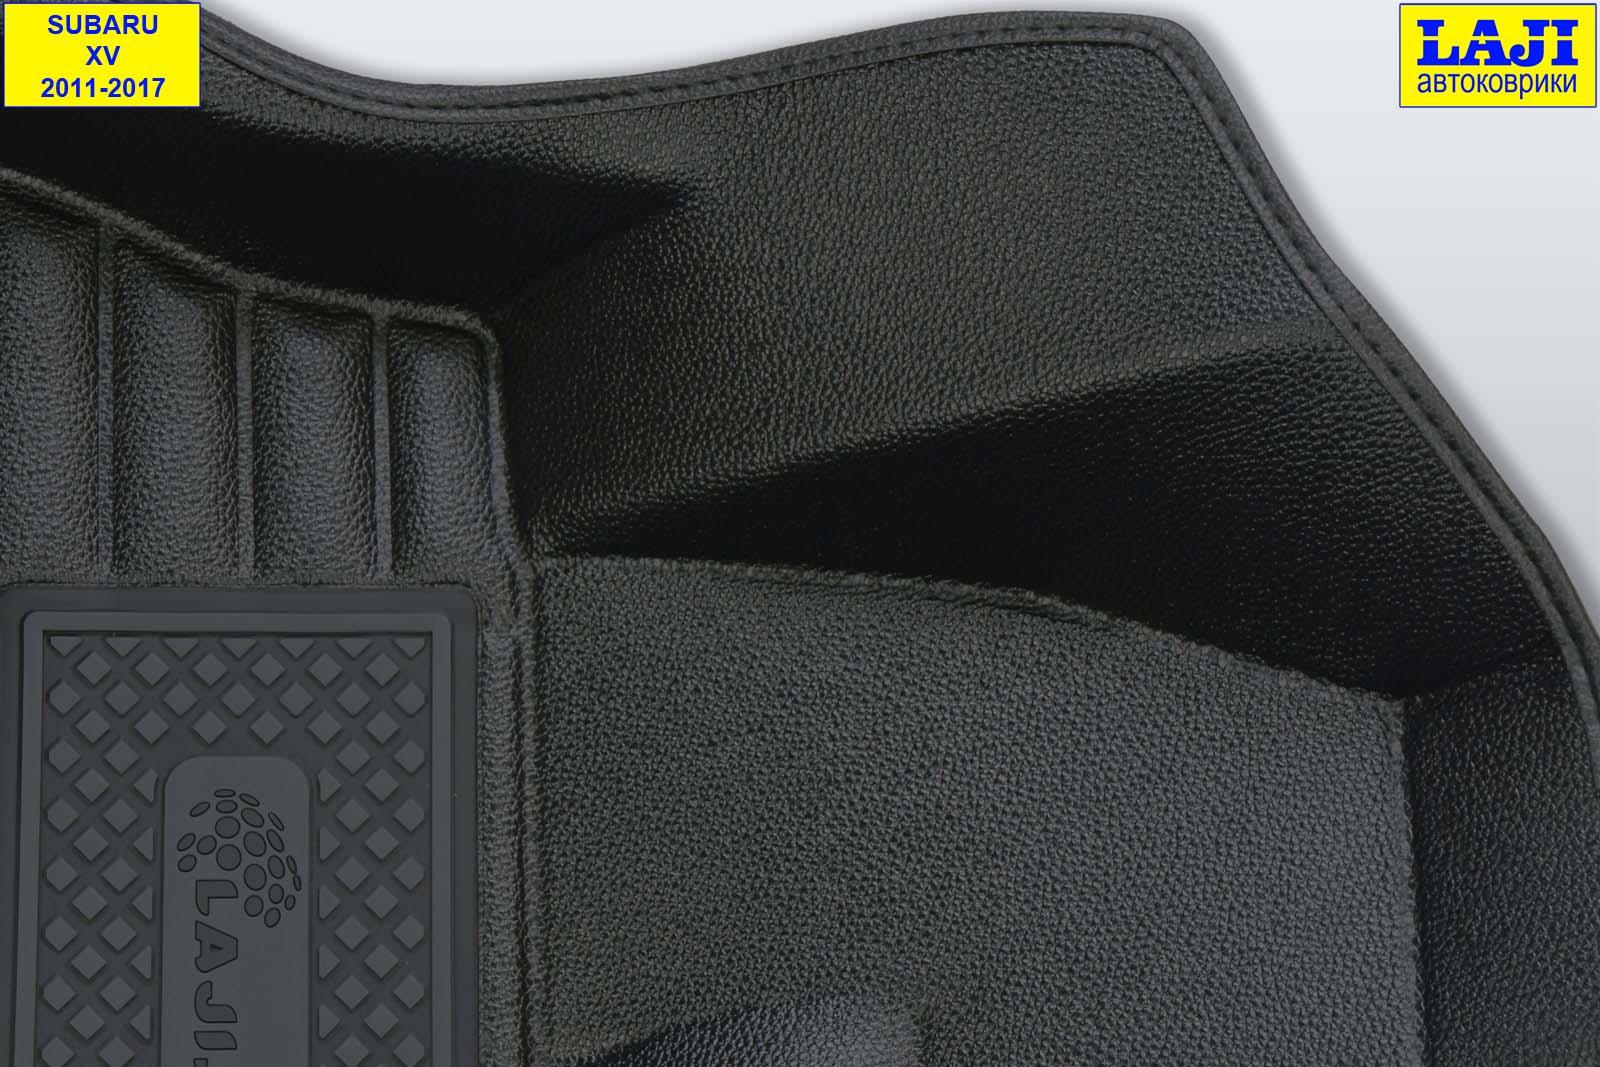 5D коврики в салон Subaru XV 2011-2017 6